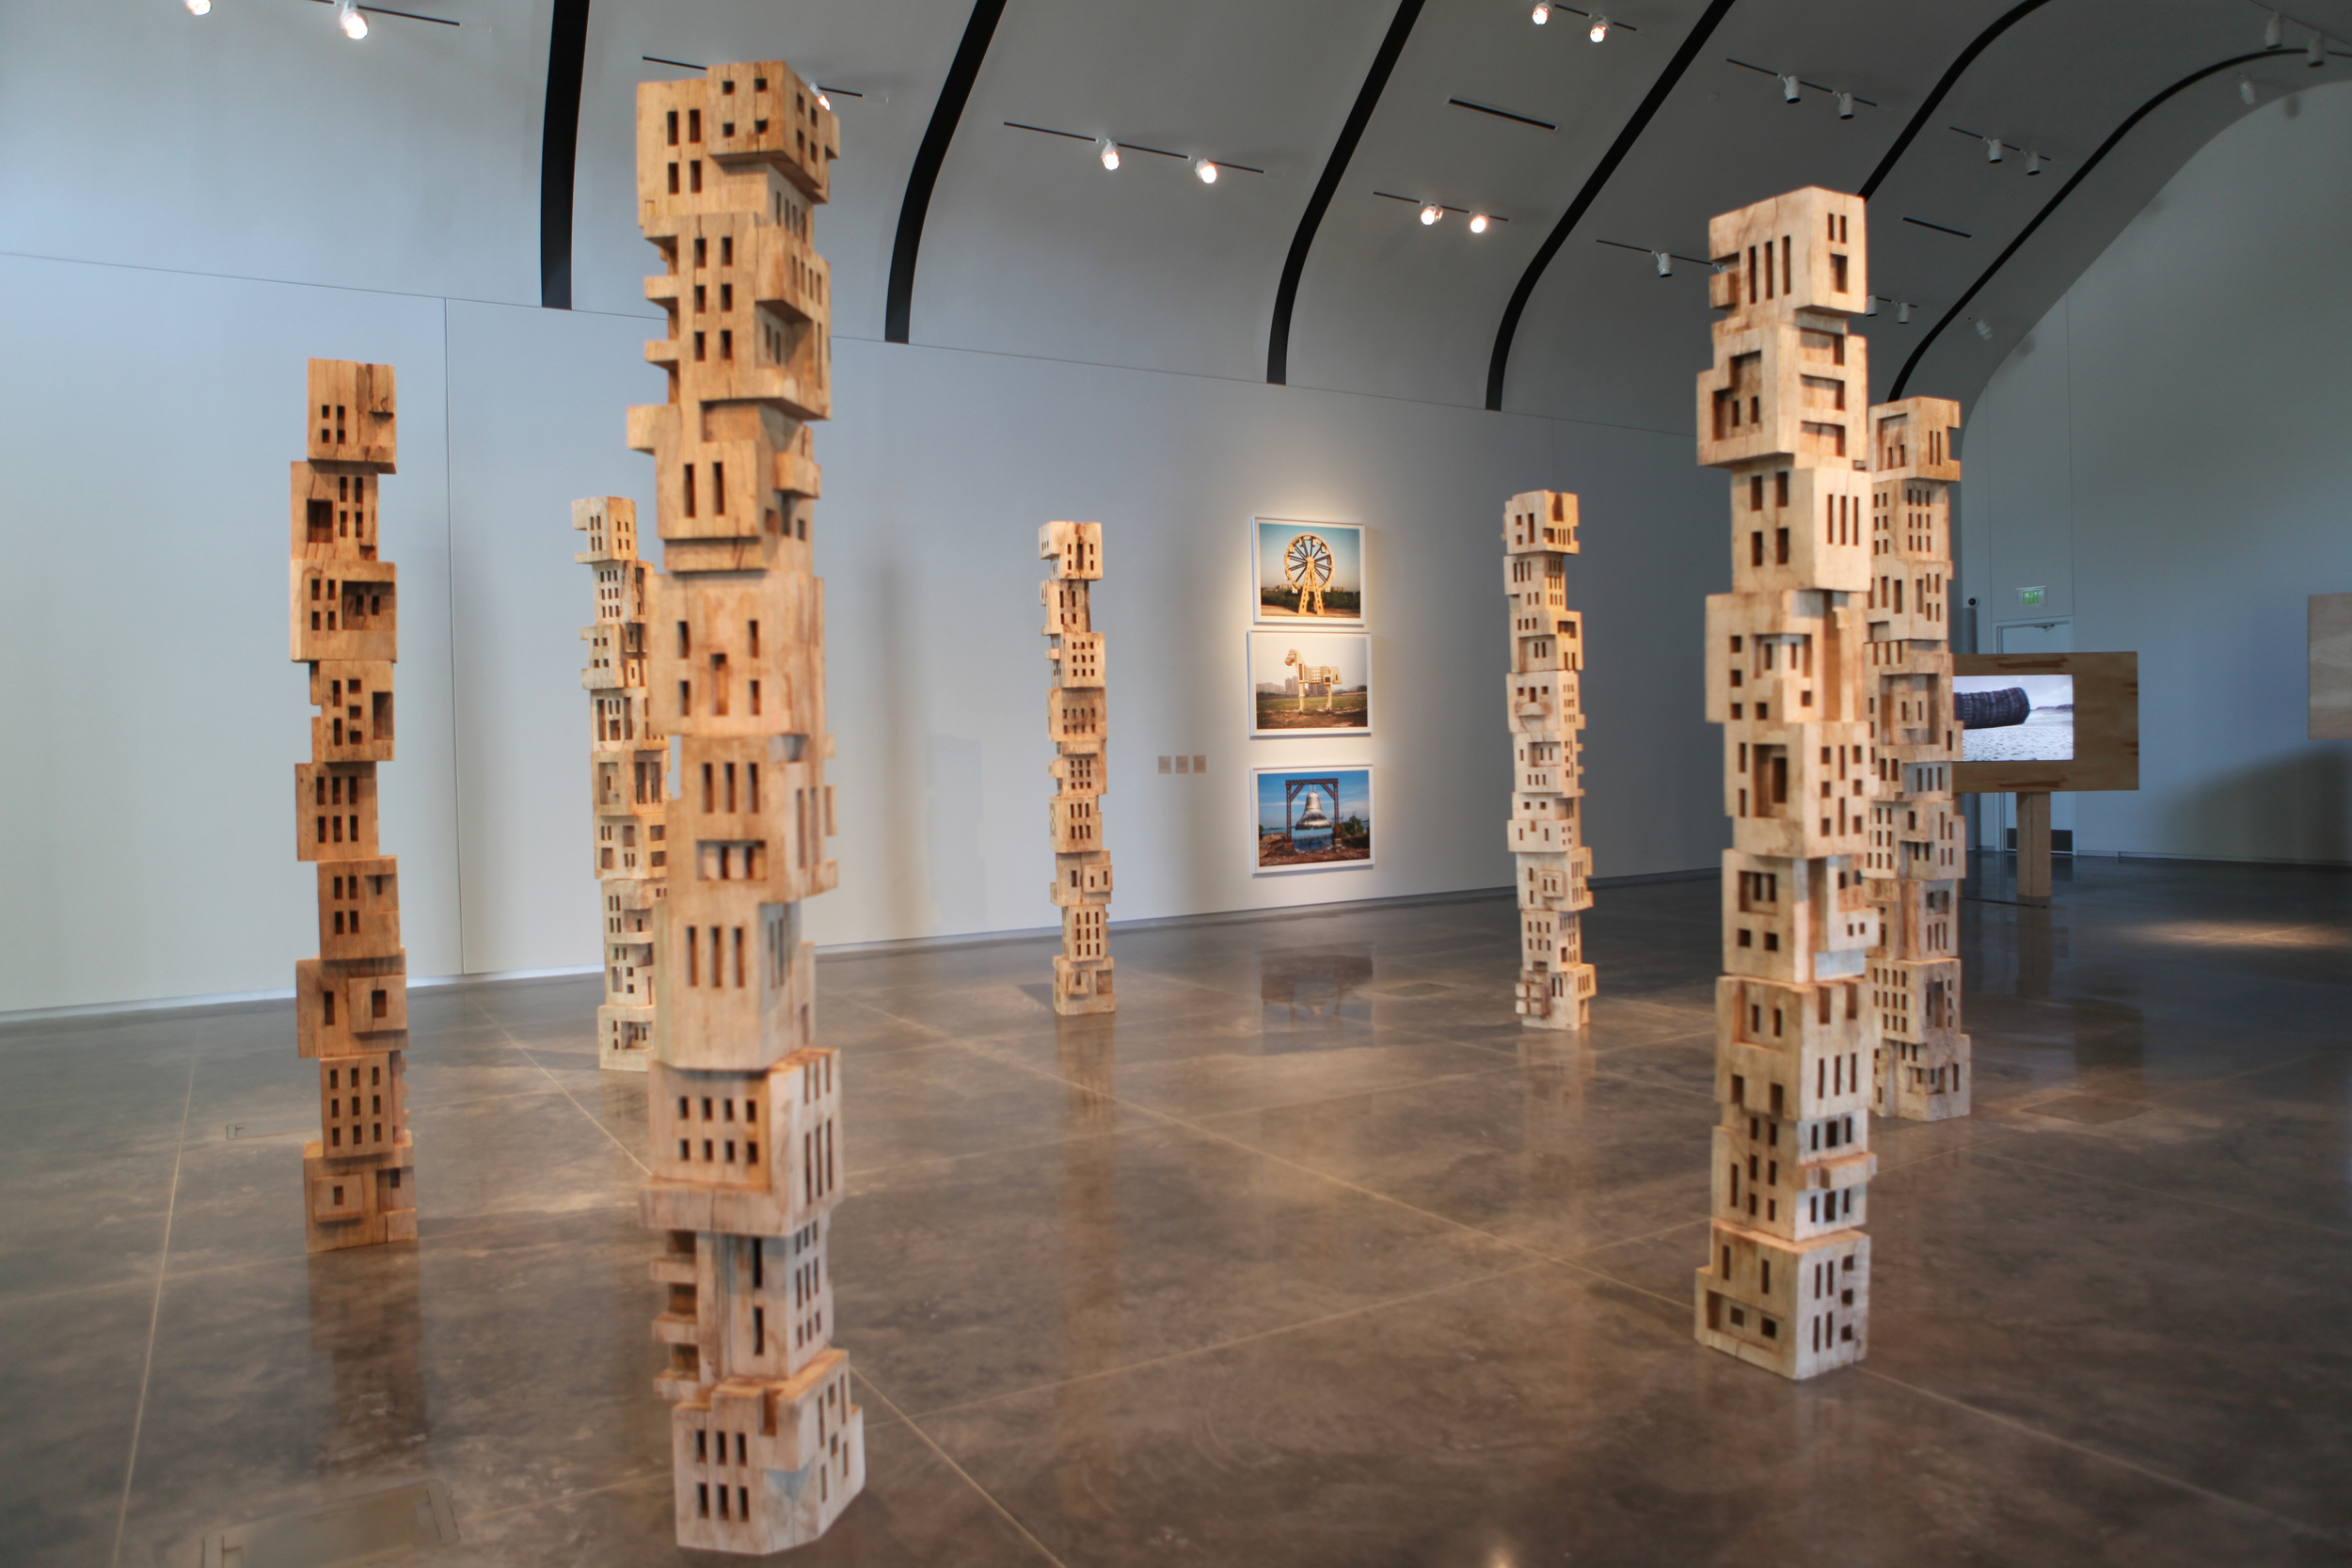 Gigi Scaria, 'Woodhenge', 2016, wood, paint, glue, 144 in each (7 poles). Image courtesy the artist.